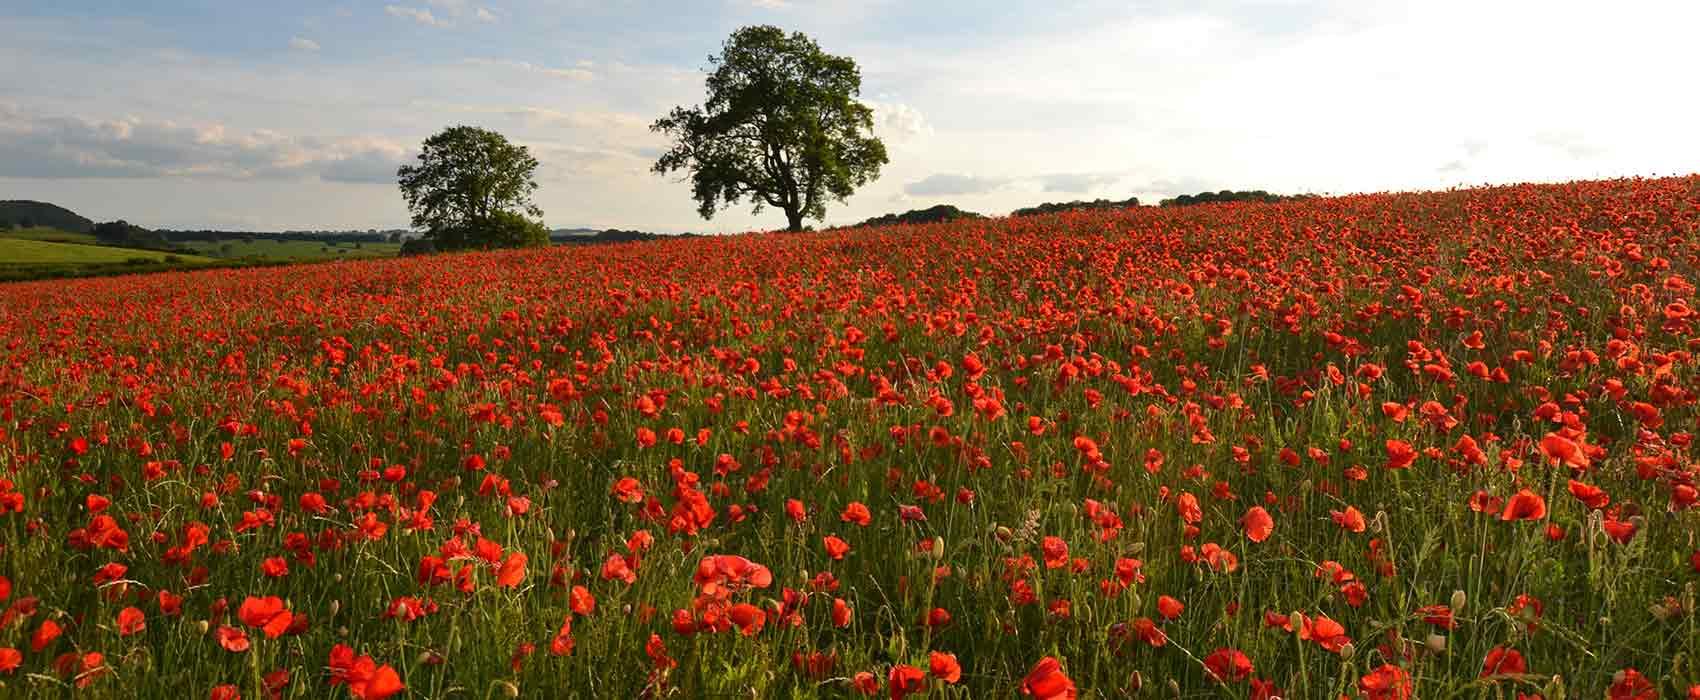 Field-of-poppies-Baslow-towards-Chatsworth